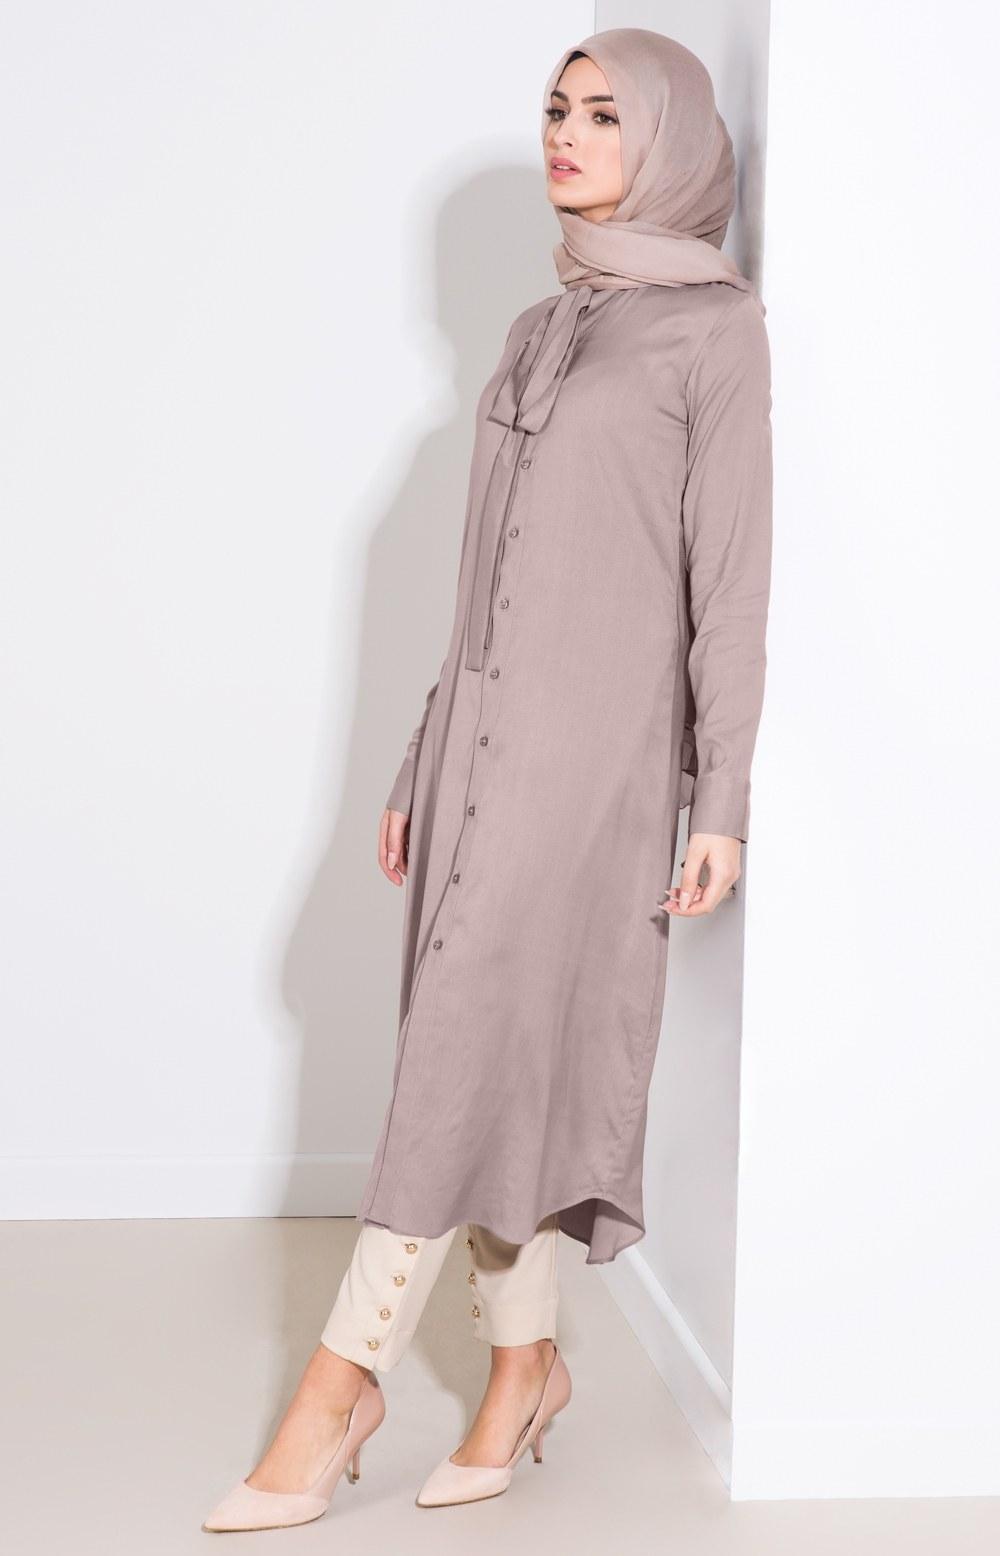 Model Baju Lebaran Trend Q0d4 25 Trend Model Baju Muslim Lebaran 2018 Simple & Modis